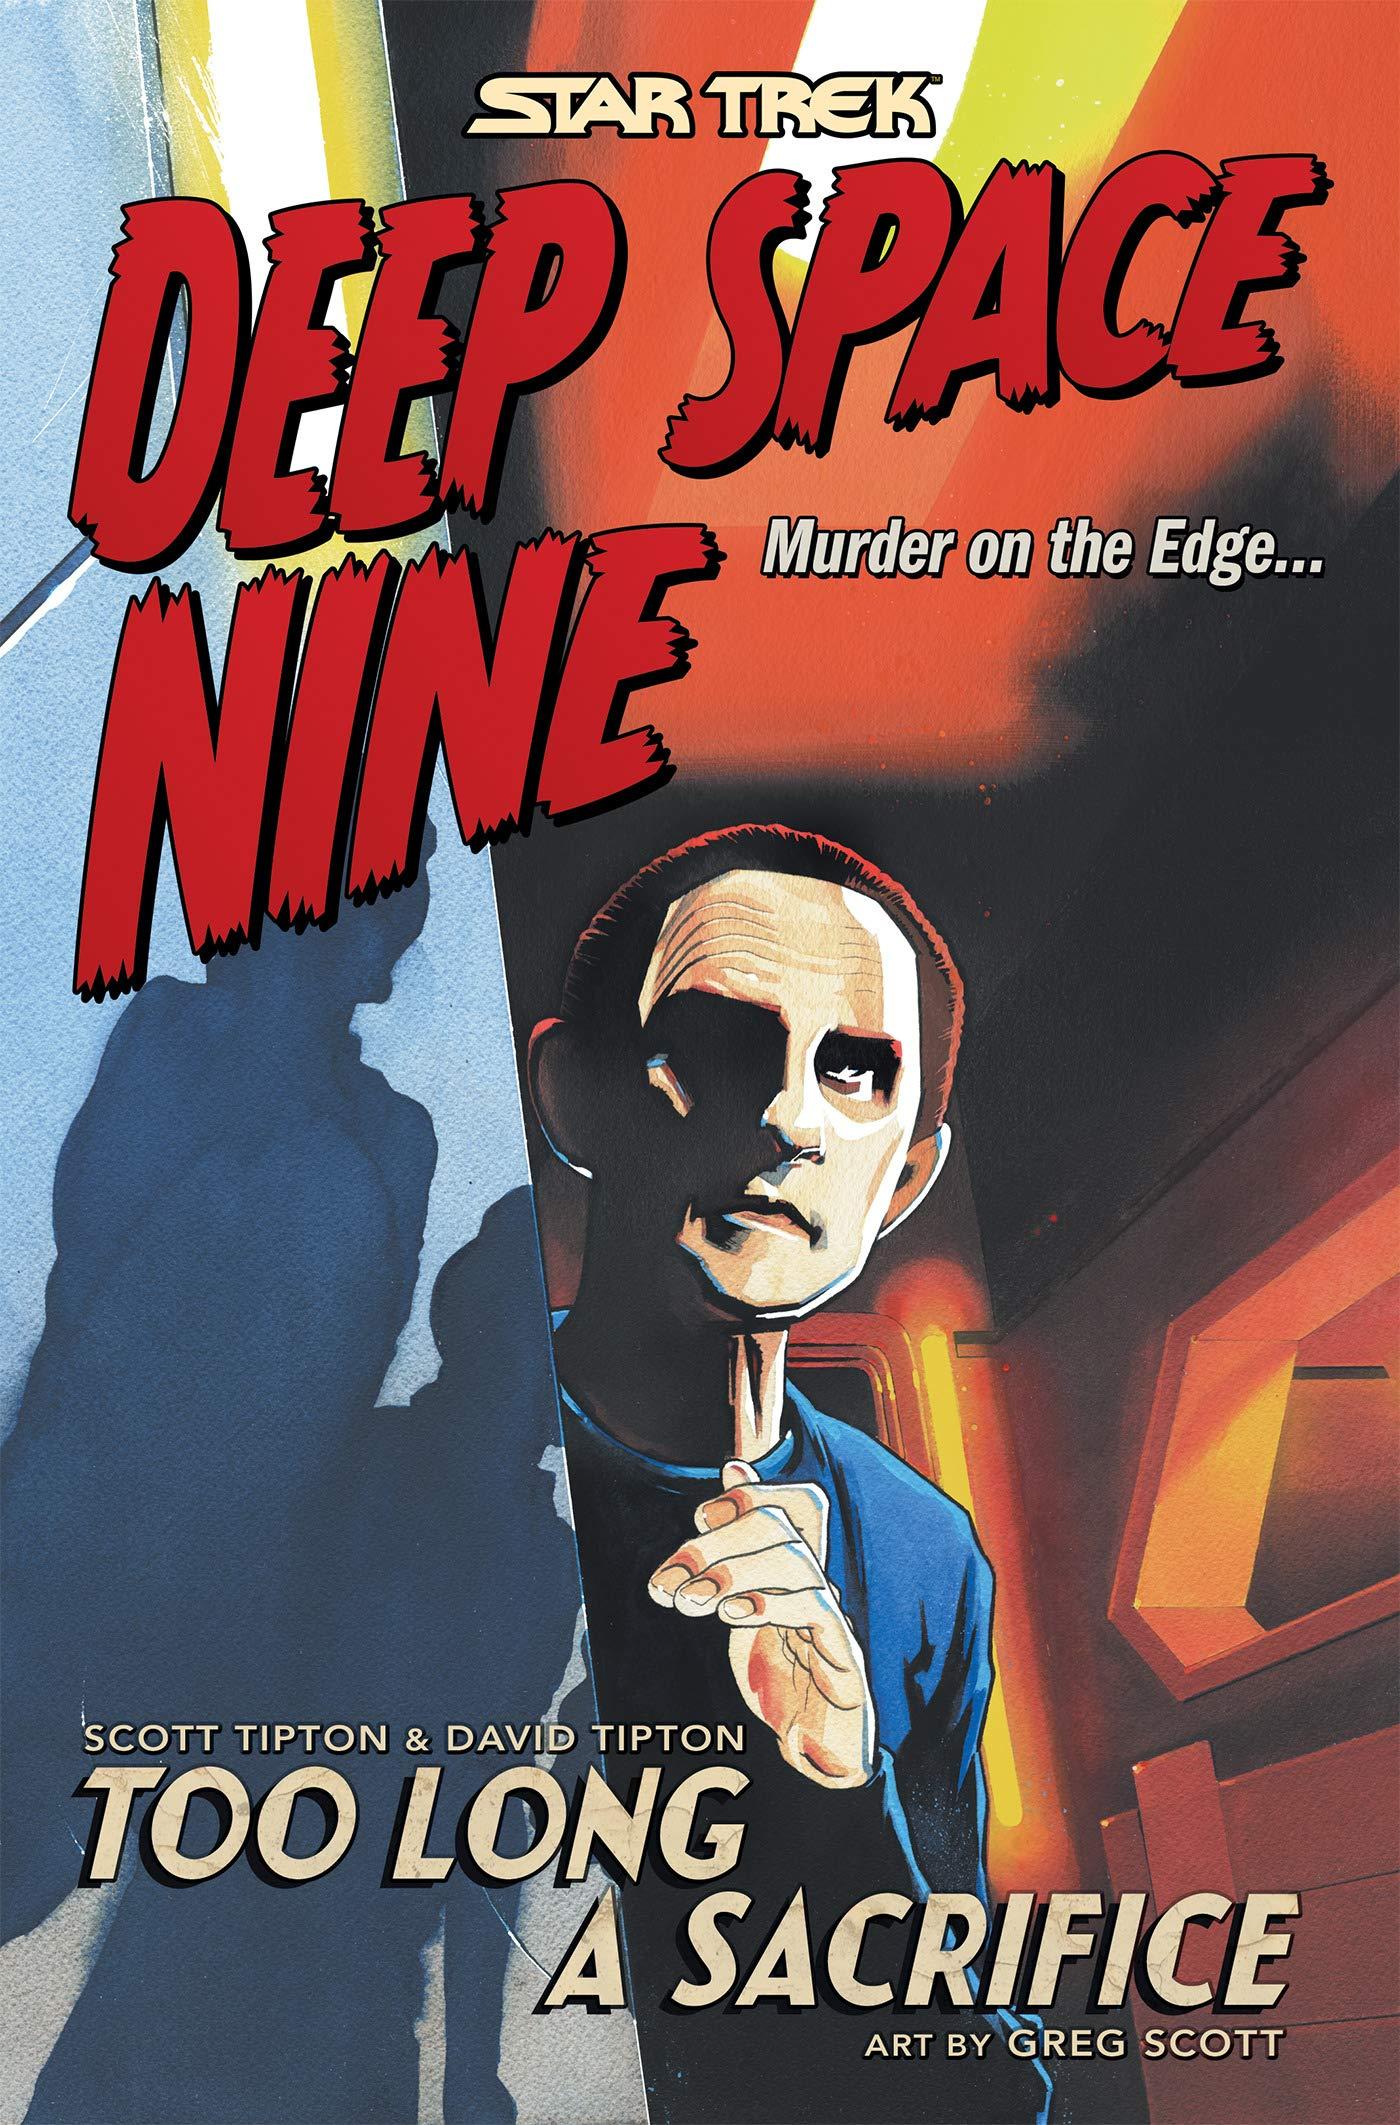 Star Trek: Deep Space Nine - Too Long a Sacrifice (omnibus)